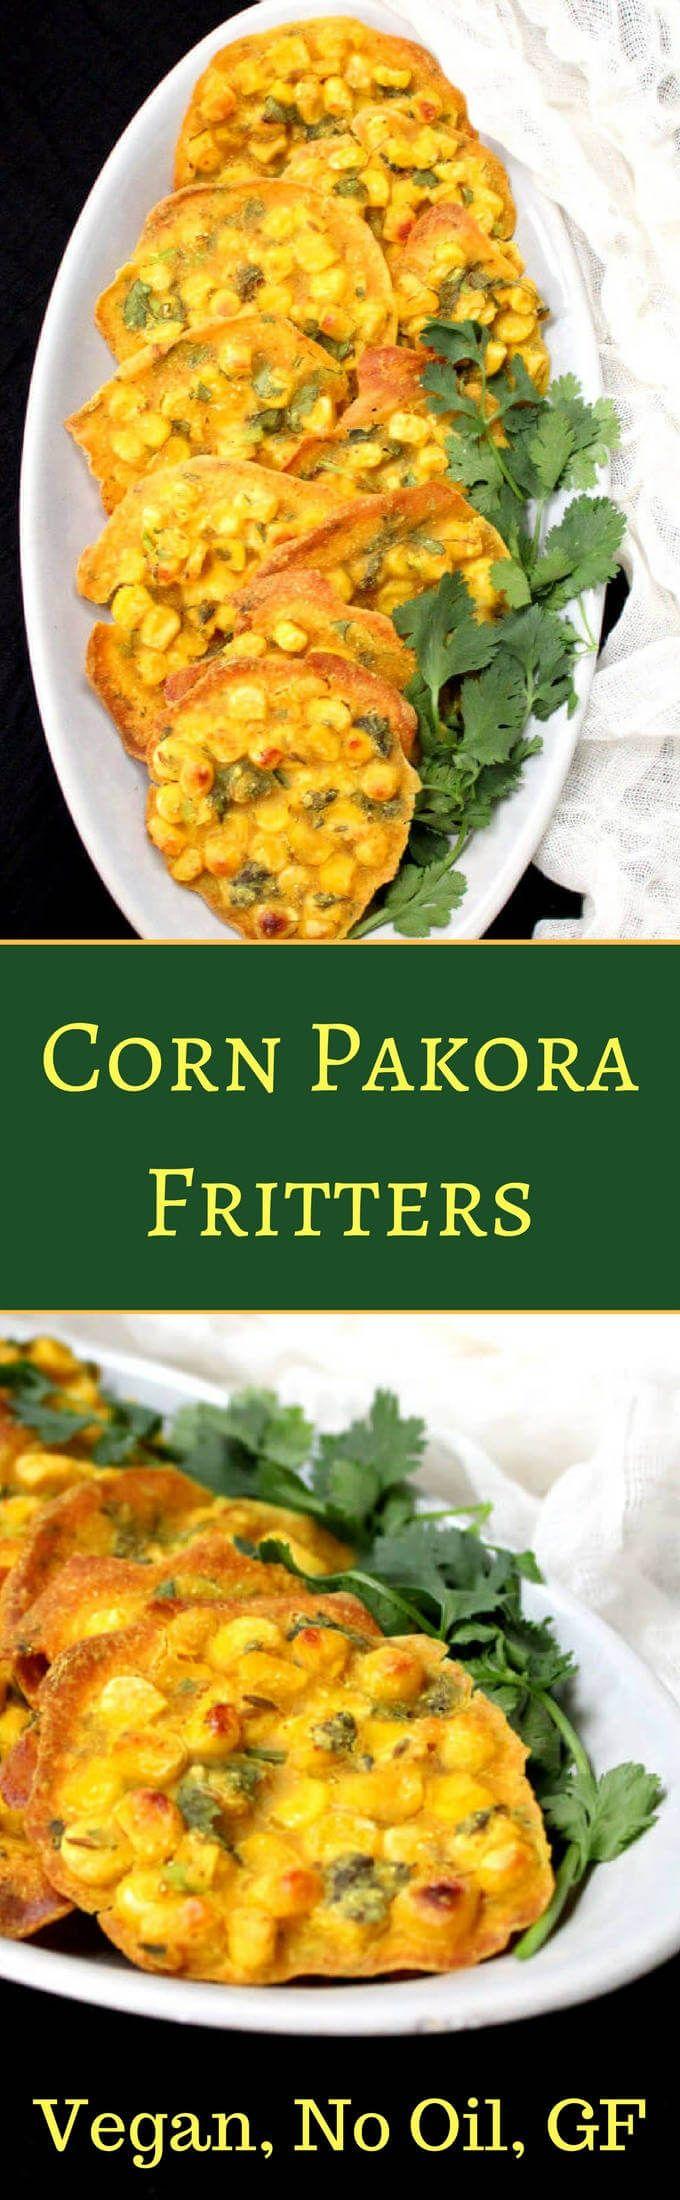 44 best indian vegan and gluten free recipes images on pinterest corn pakora fritters baked no oil indian snacksindian foodsindian dishesindian recipesvegan forumfinder Images